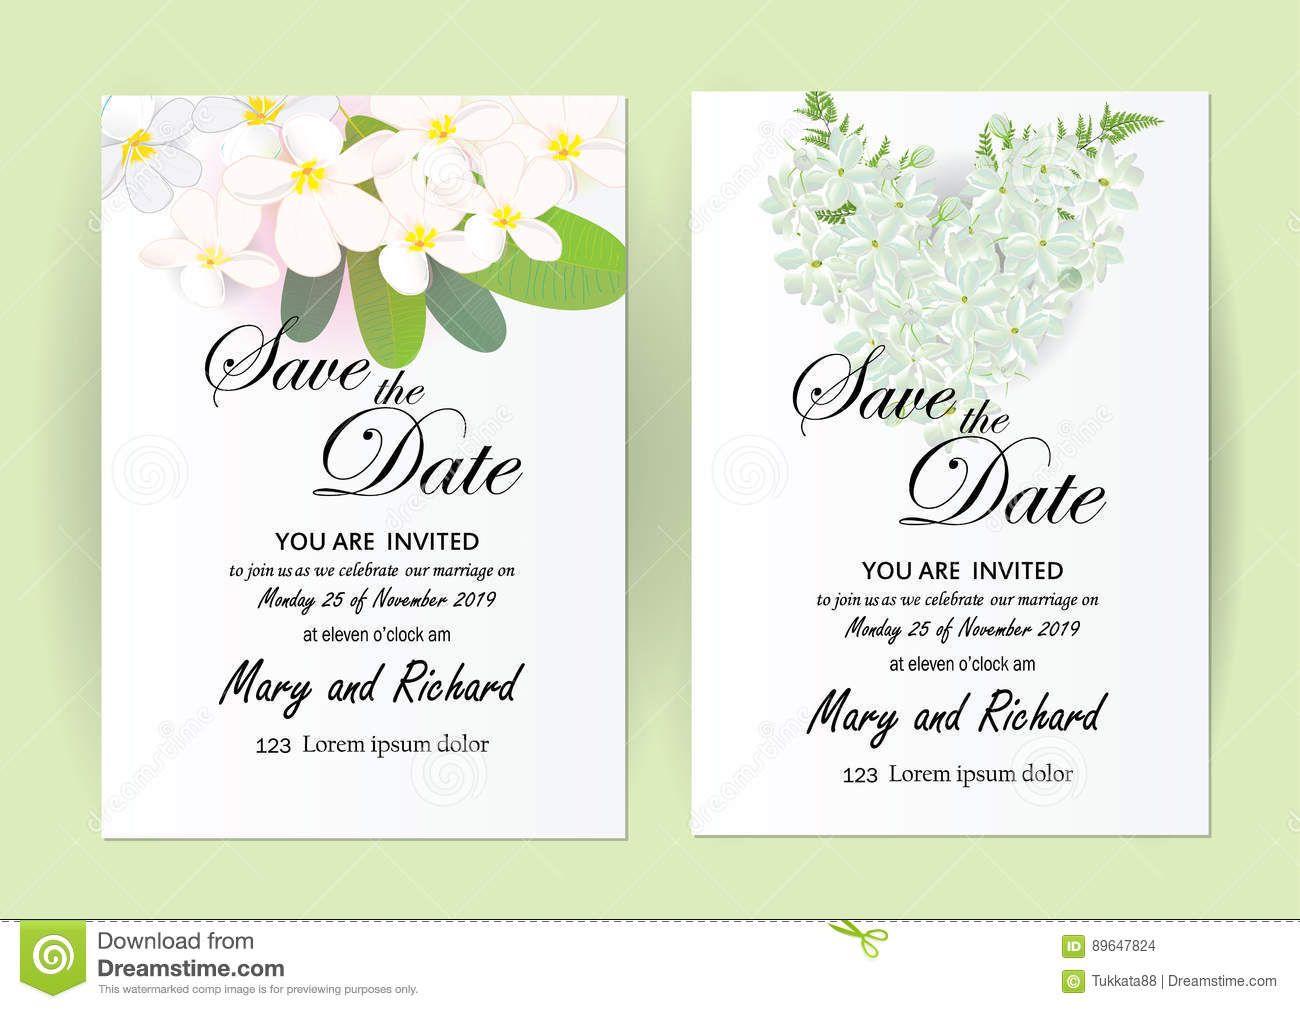 Wedding Invitation Card Flowers Jasmine Stock Vector Throughout Wedding Card Size Template Professional Wedding Cards Marriage Cards Wedding Invitation Cards